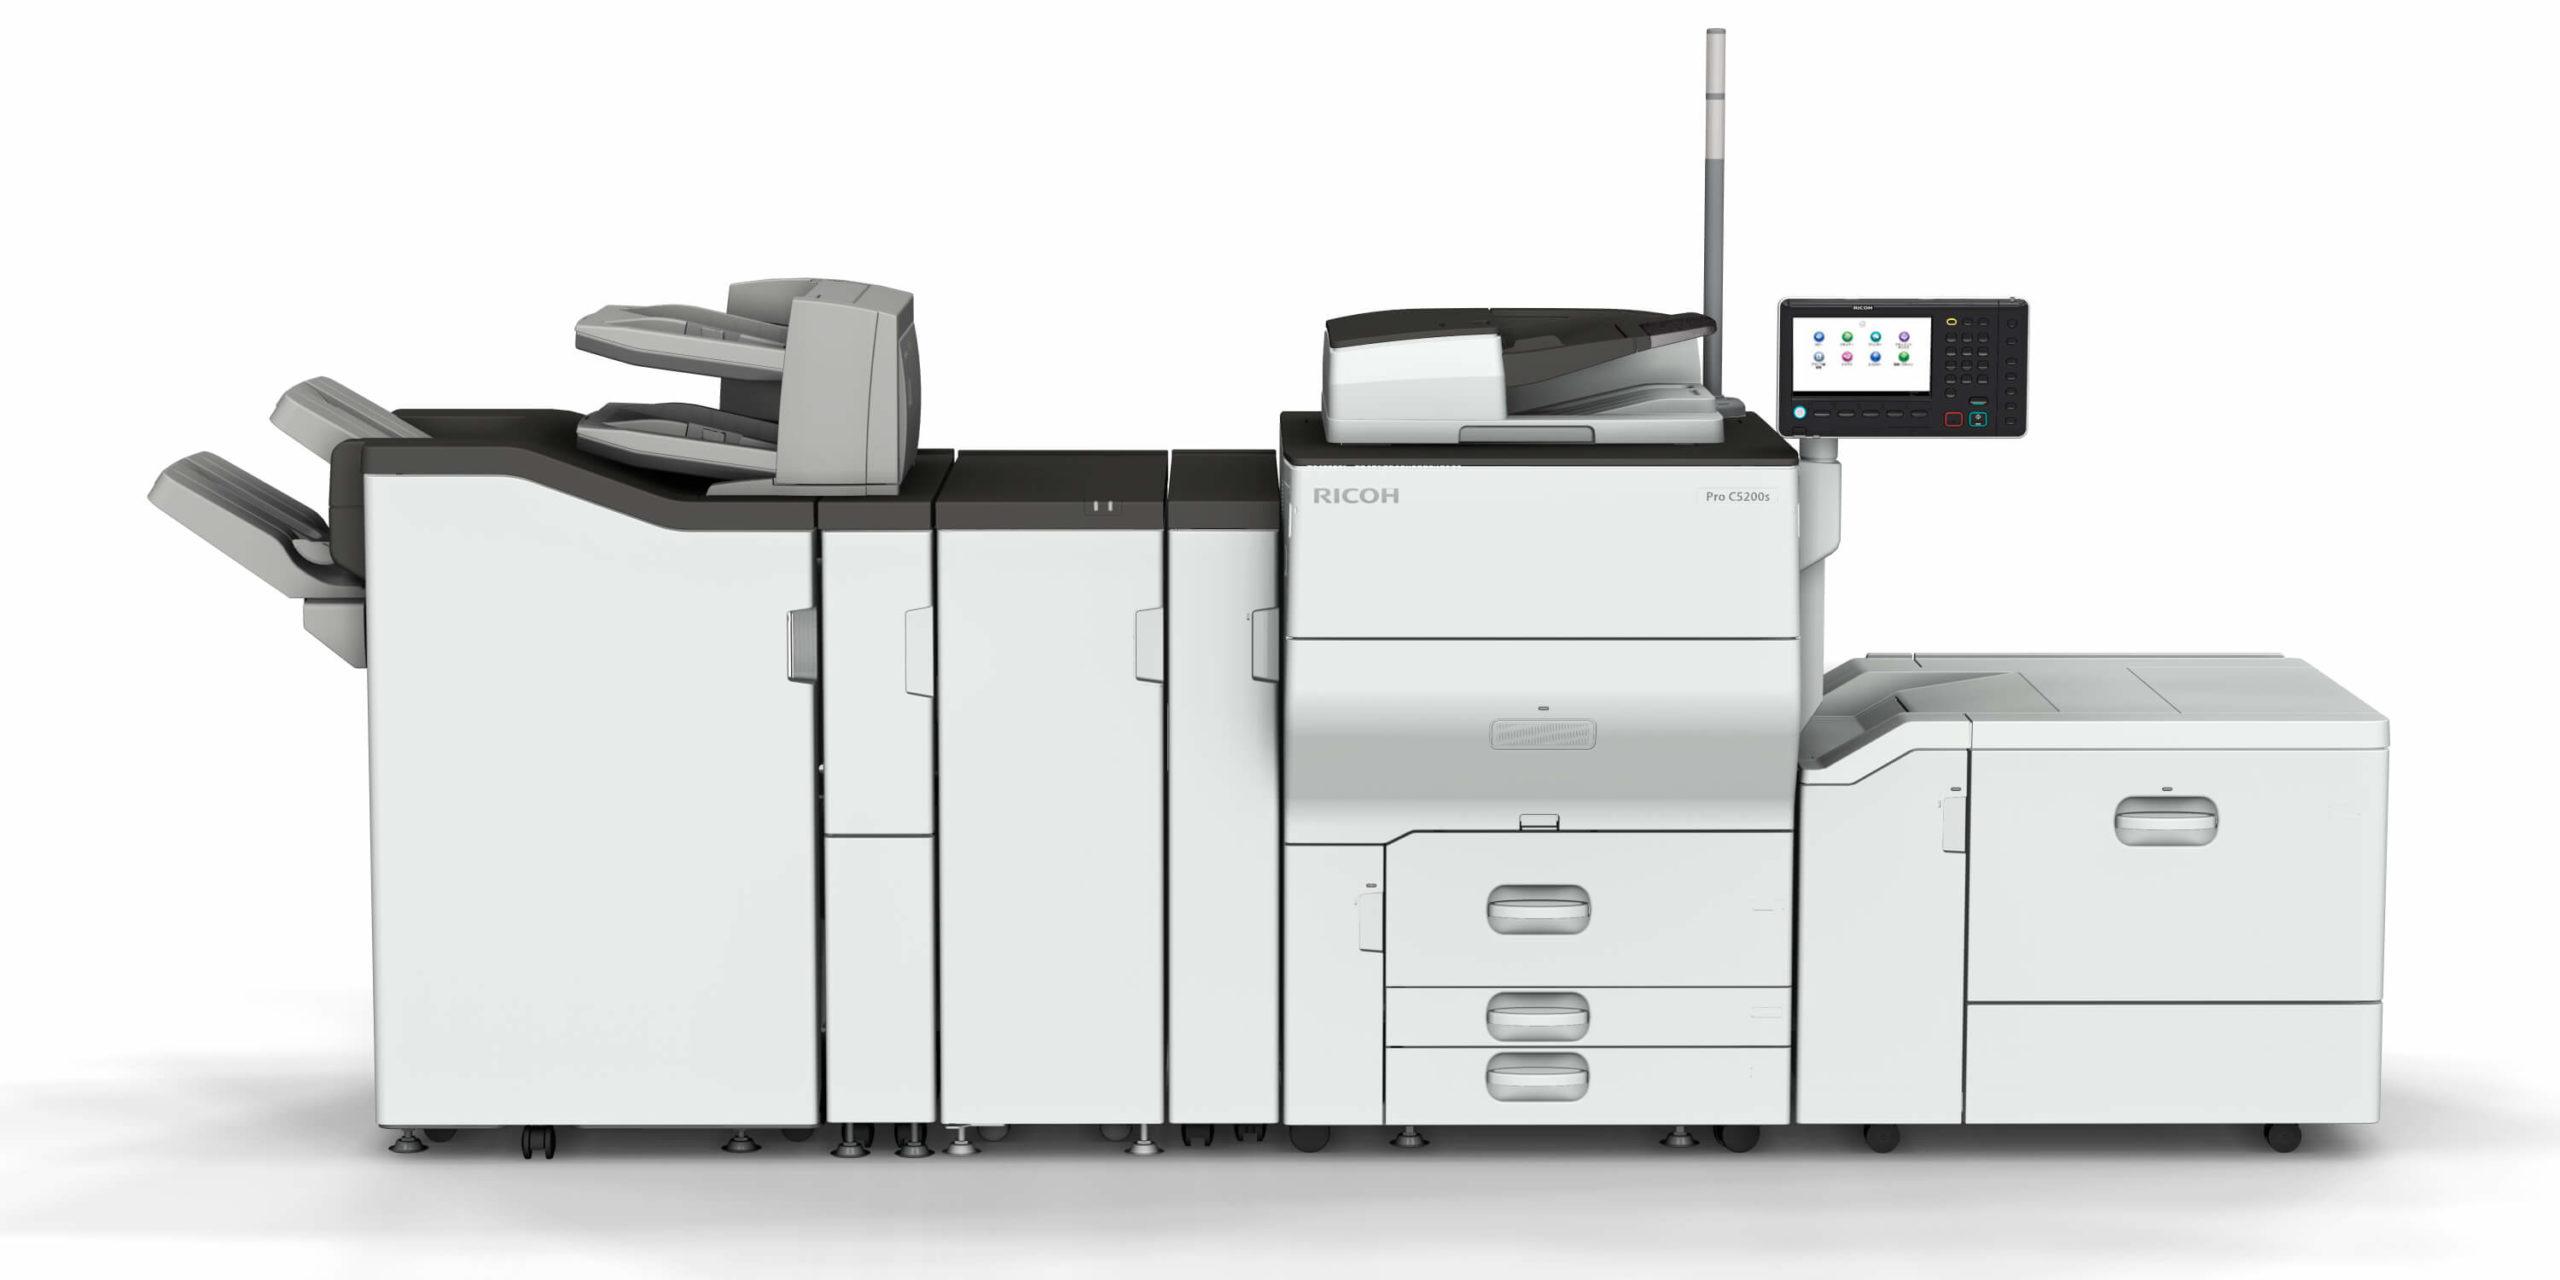 stampante ricoh 5200s